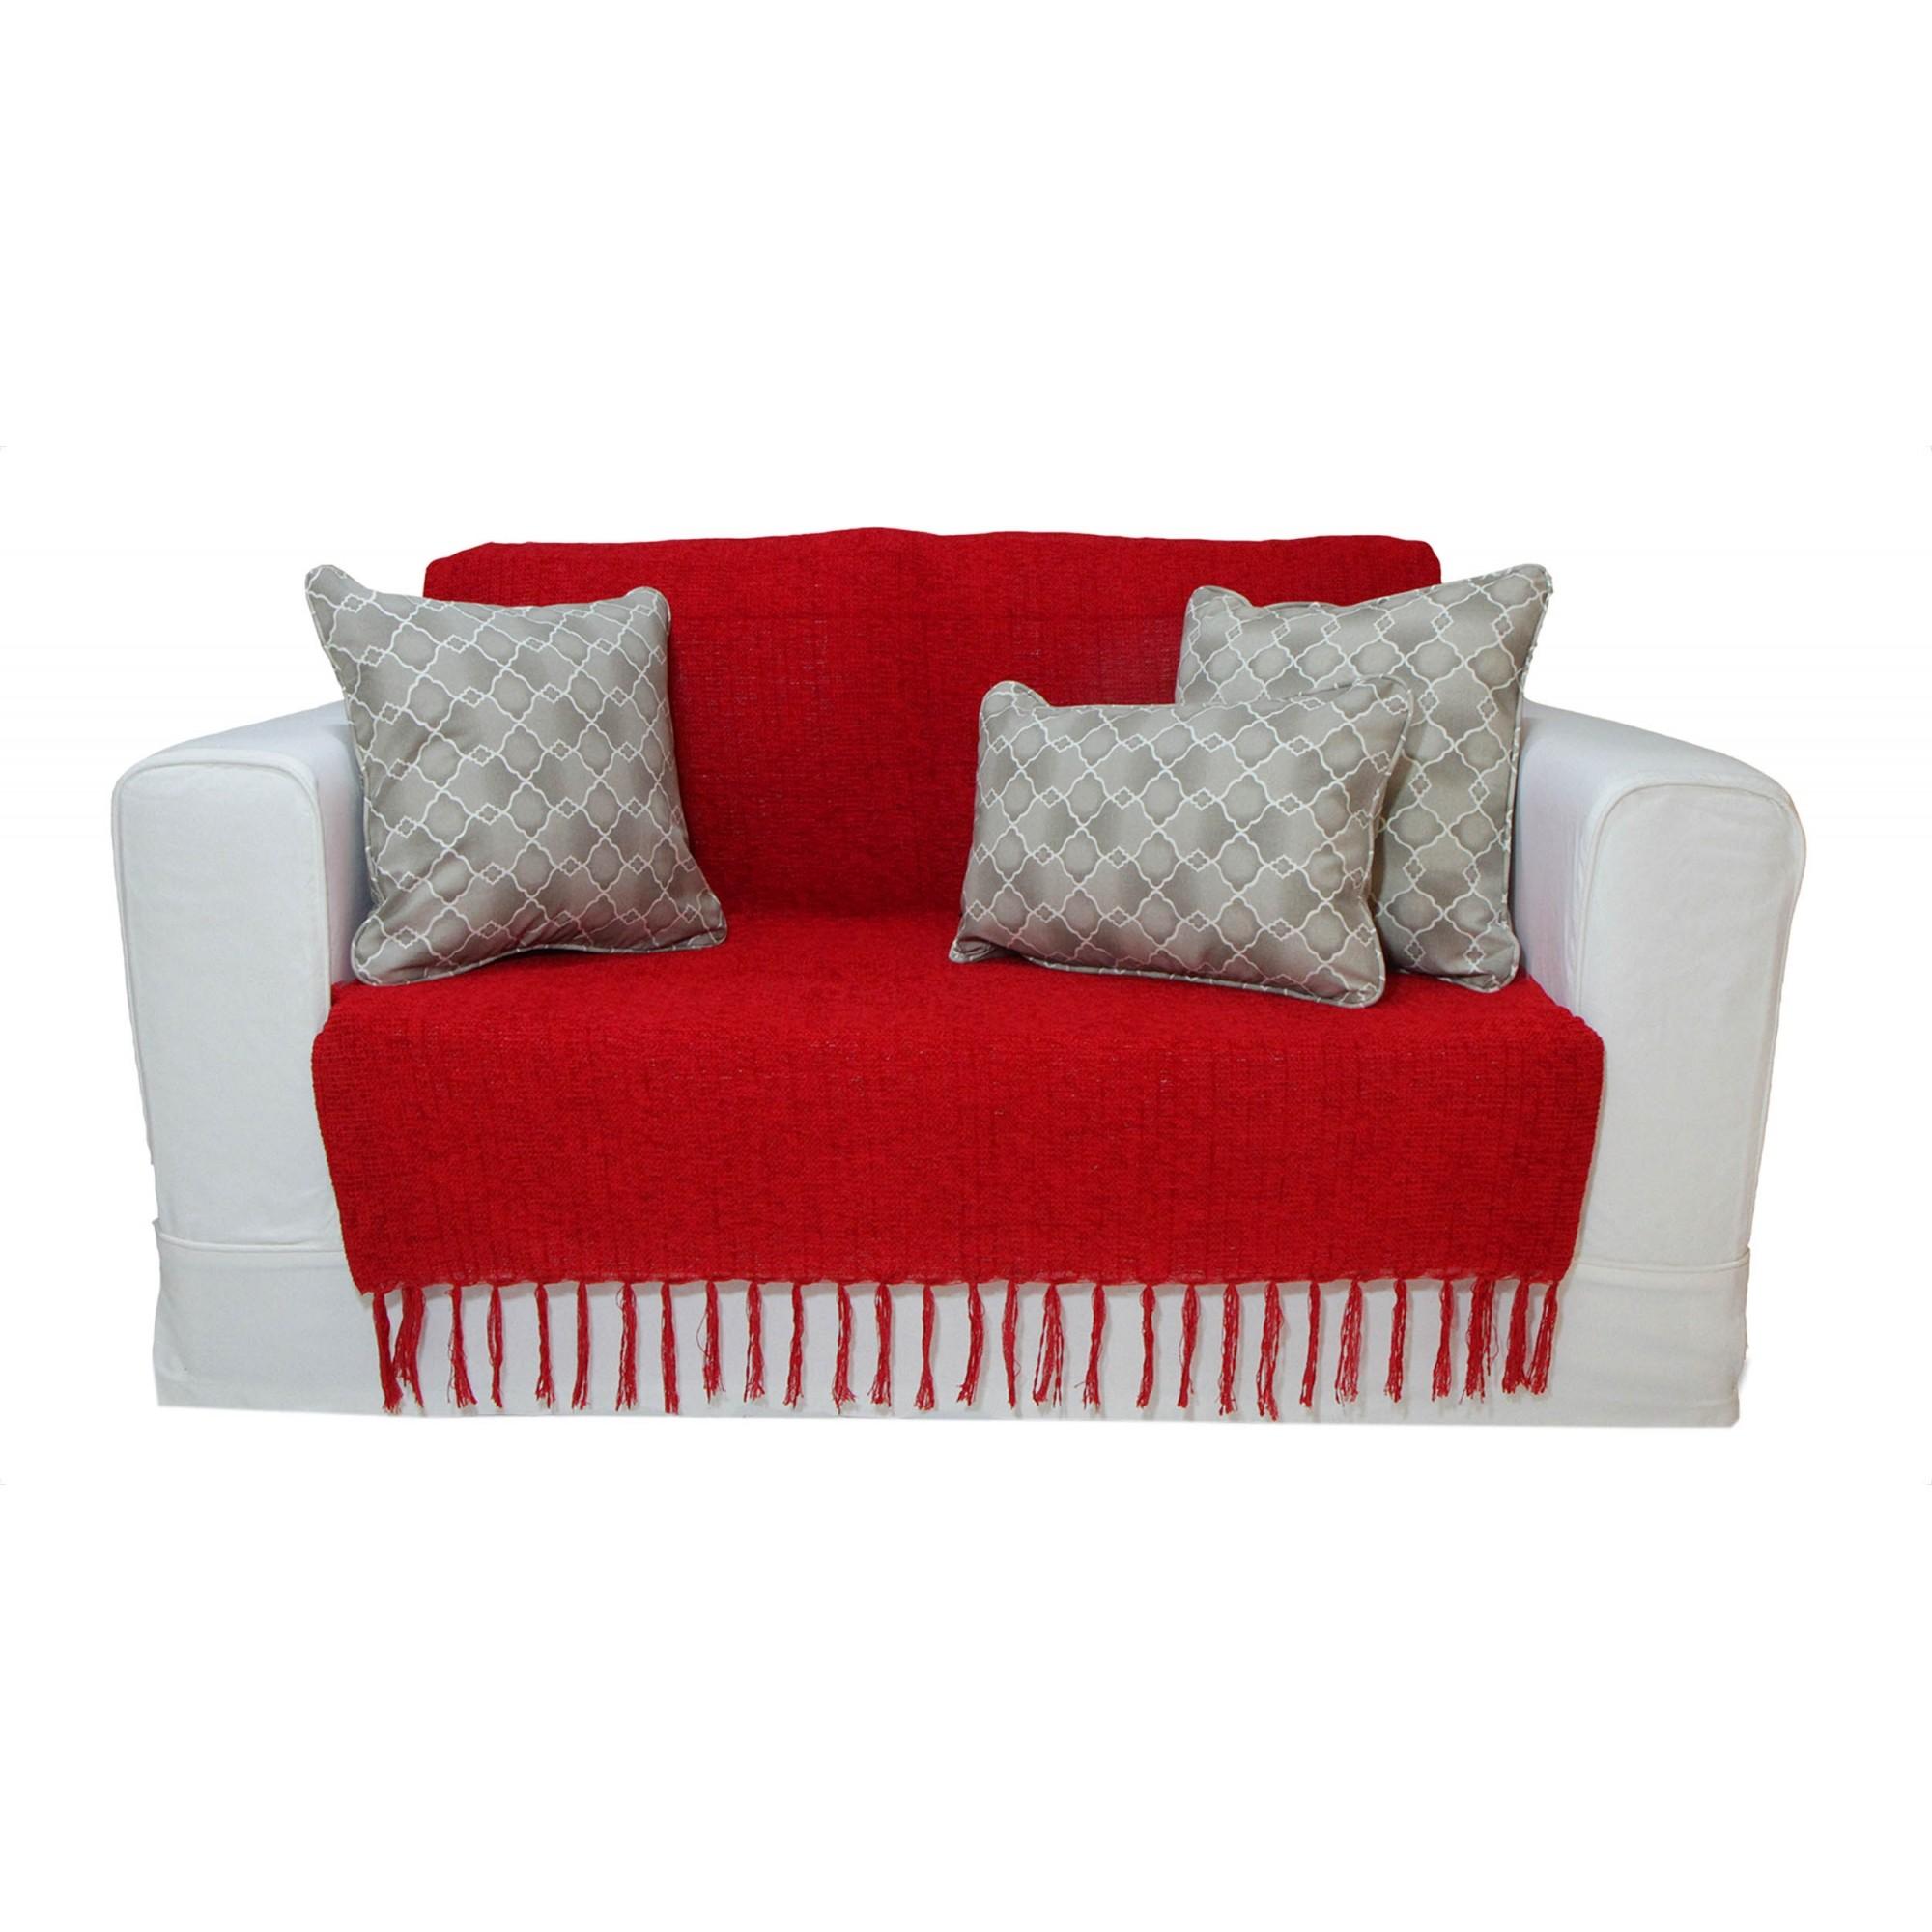 Manta Chenille Vermelha 1,20m x 1,80m